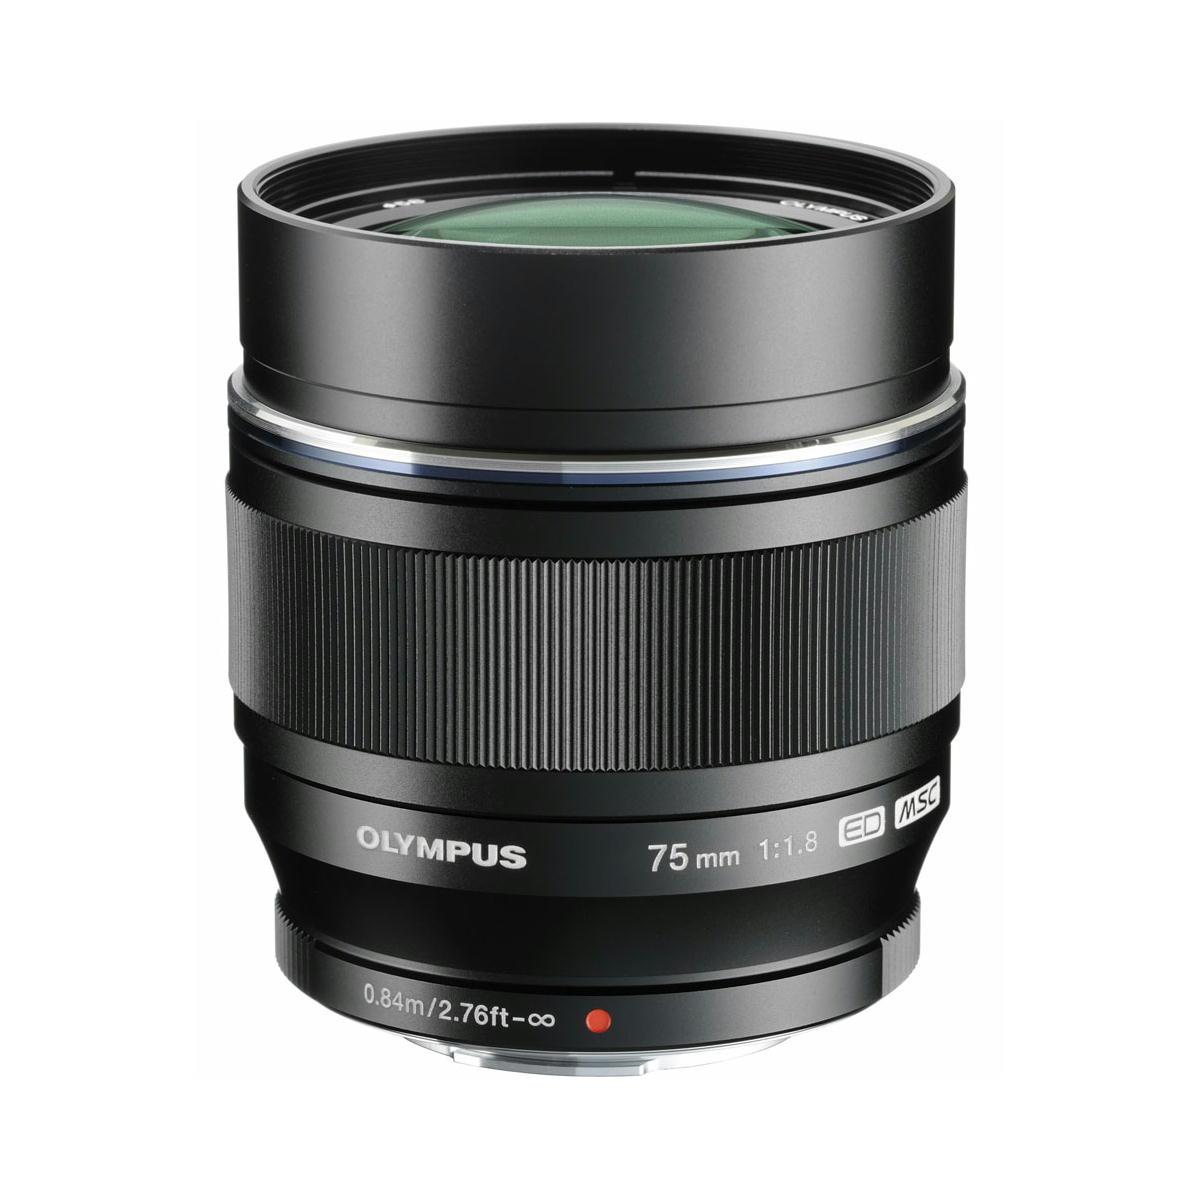 M.ZUIKO DIGITAL ED 75mm F1.8   OLYMPUS 単焦点レンズ